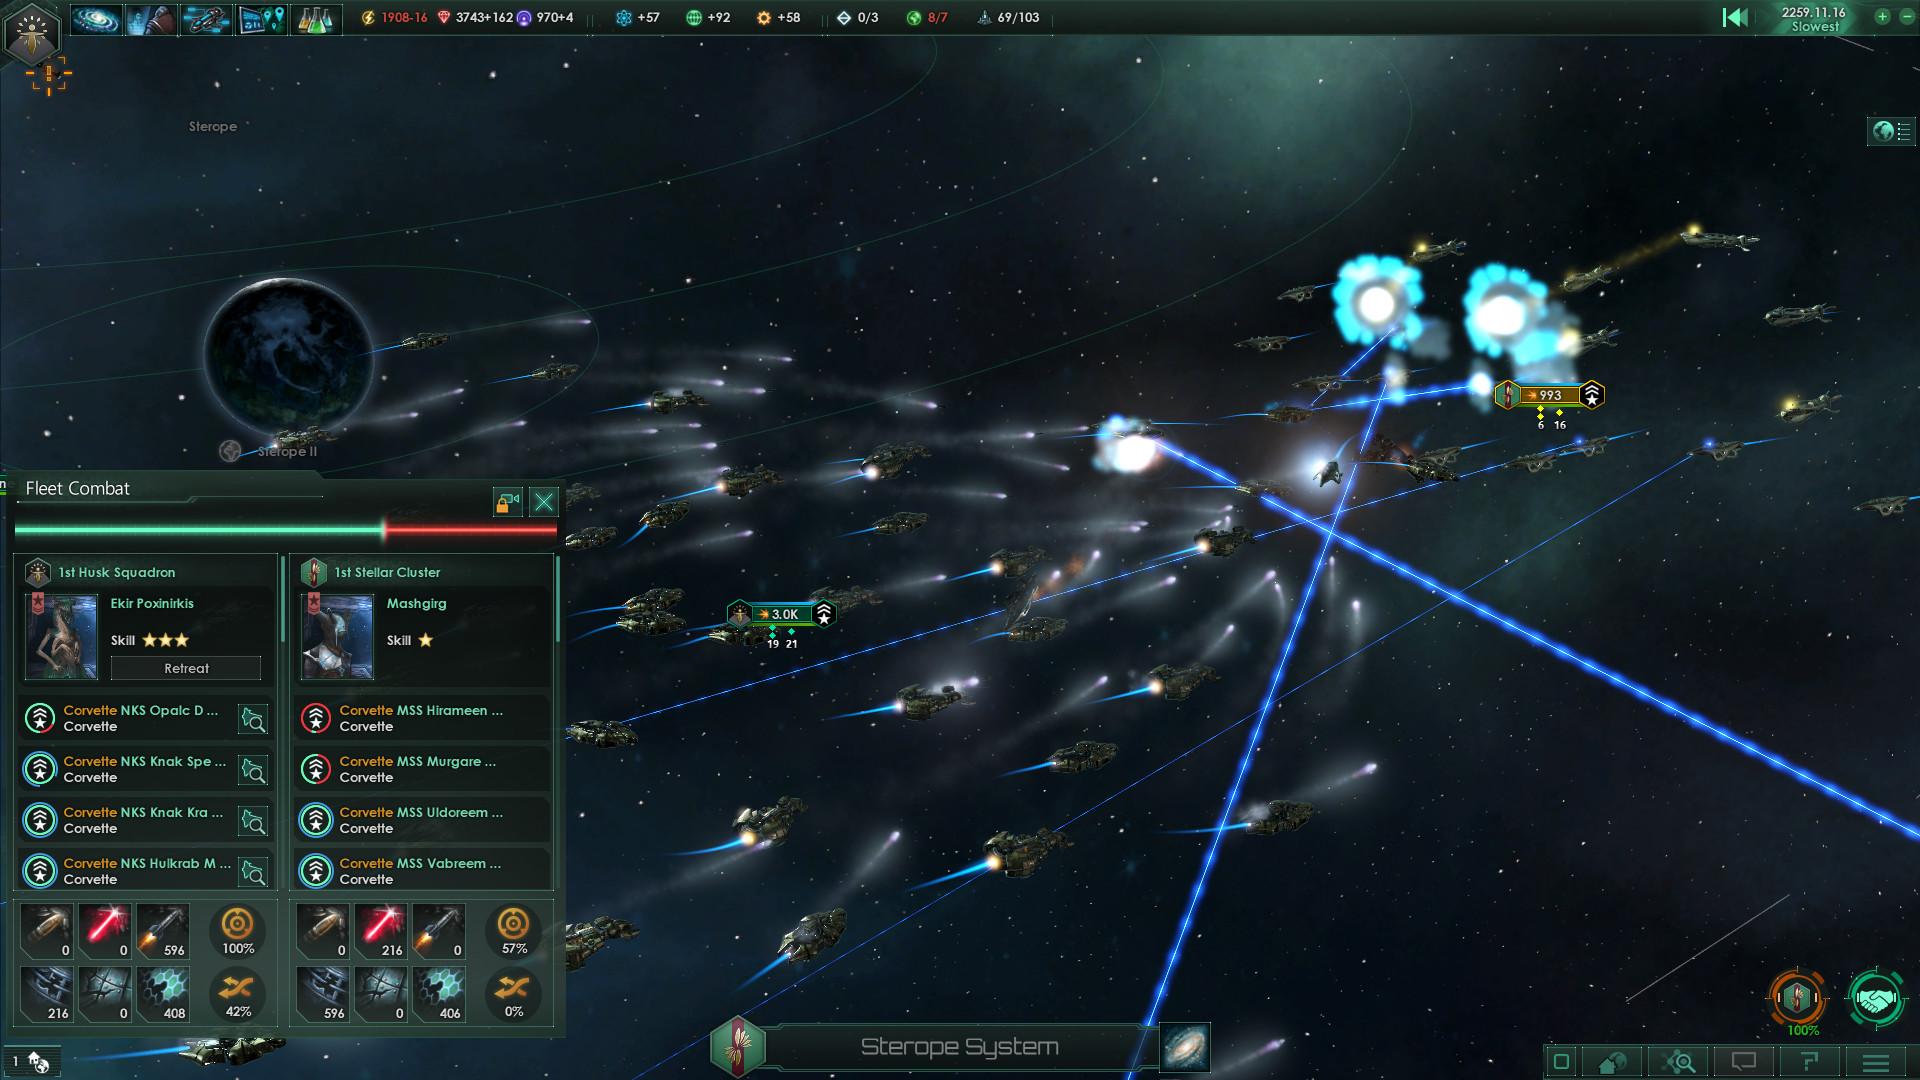 Stellaris 2